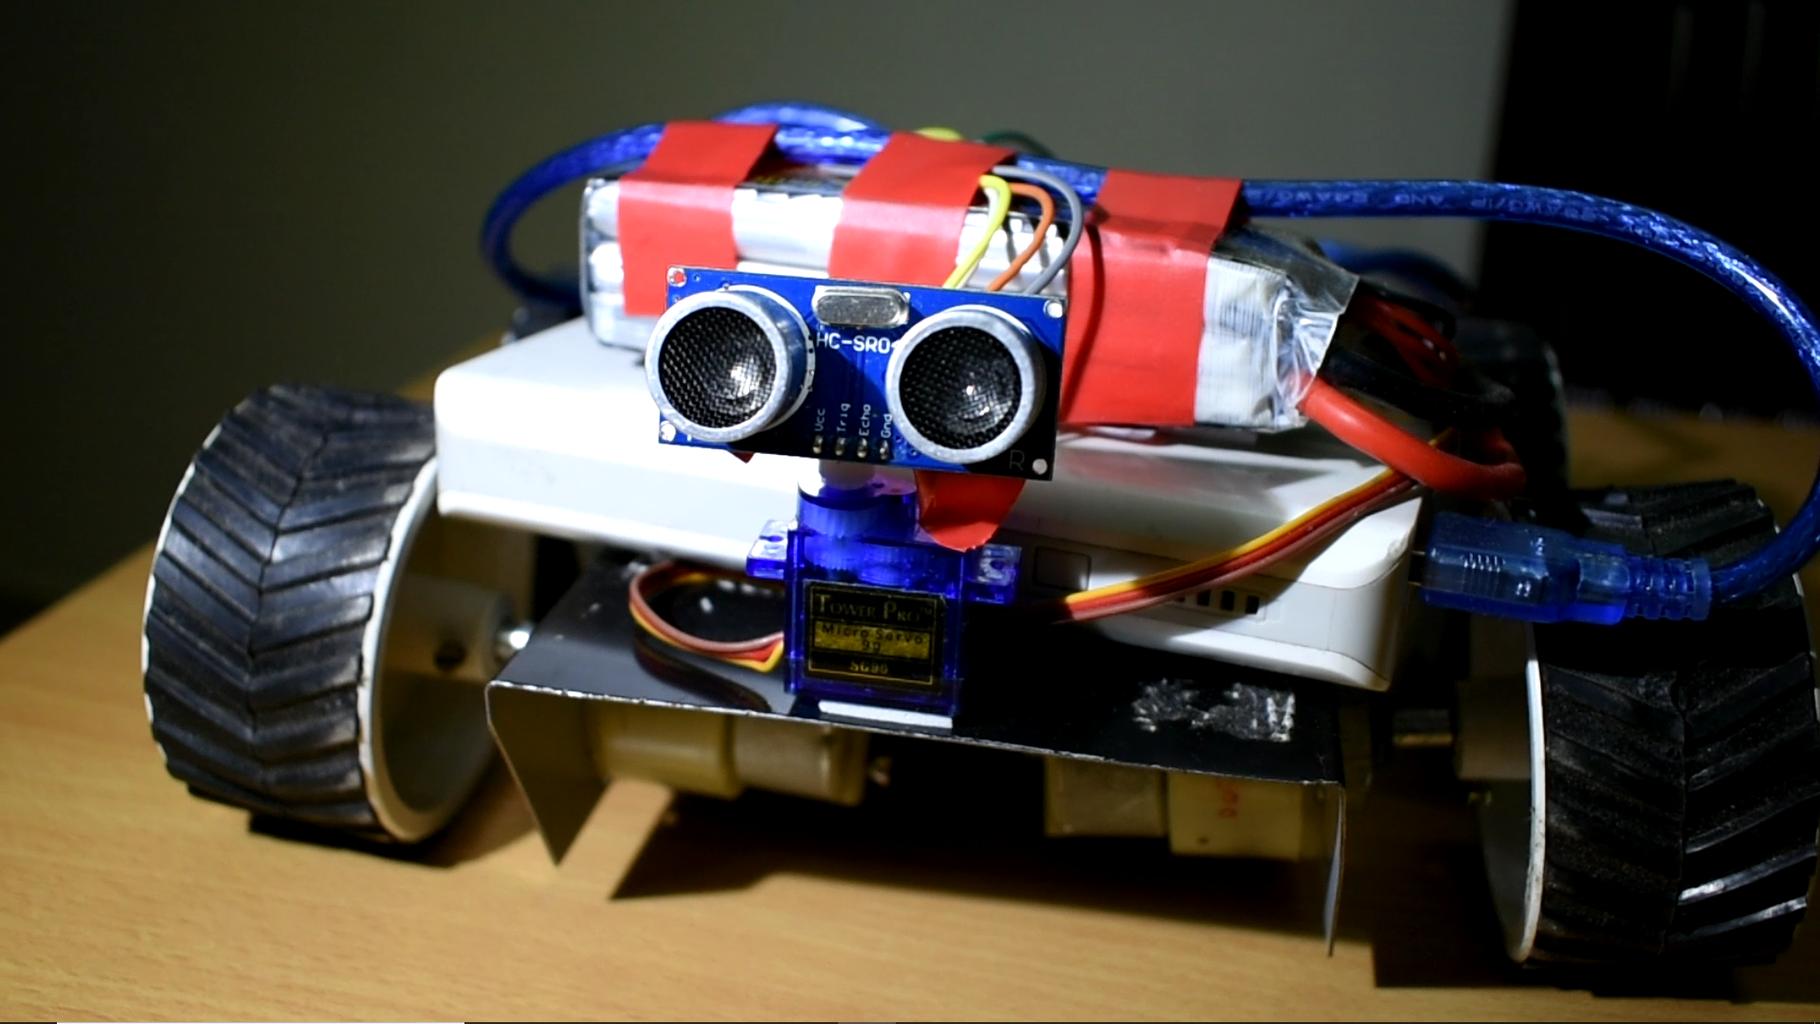 Obstacle Avoiding Robot Using Arduino (4 Wheels)